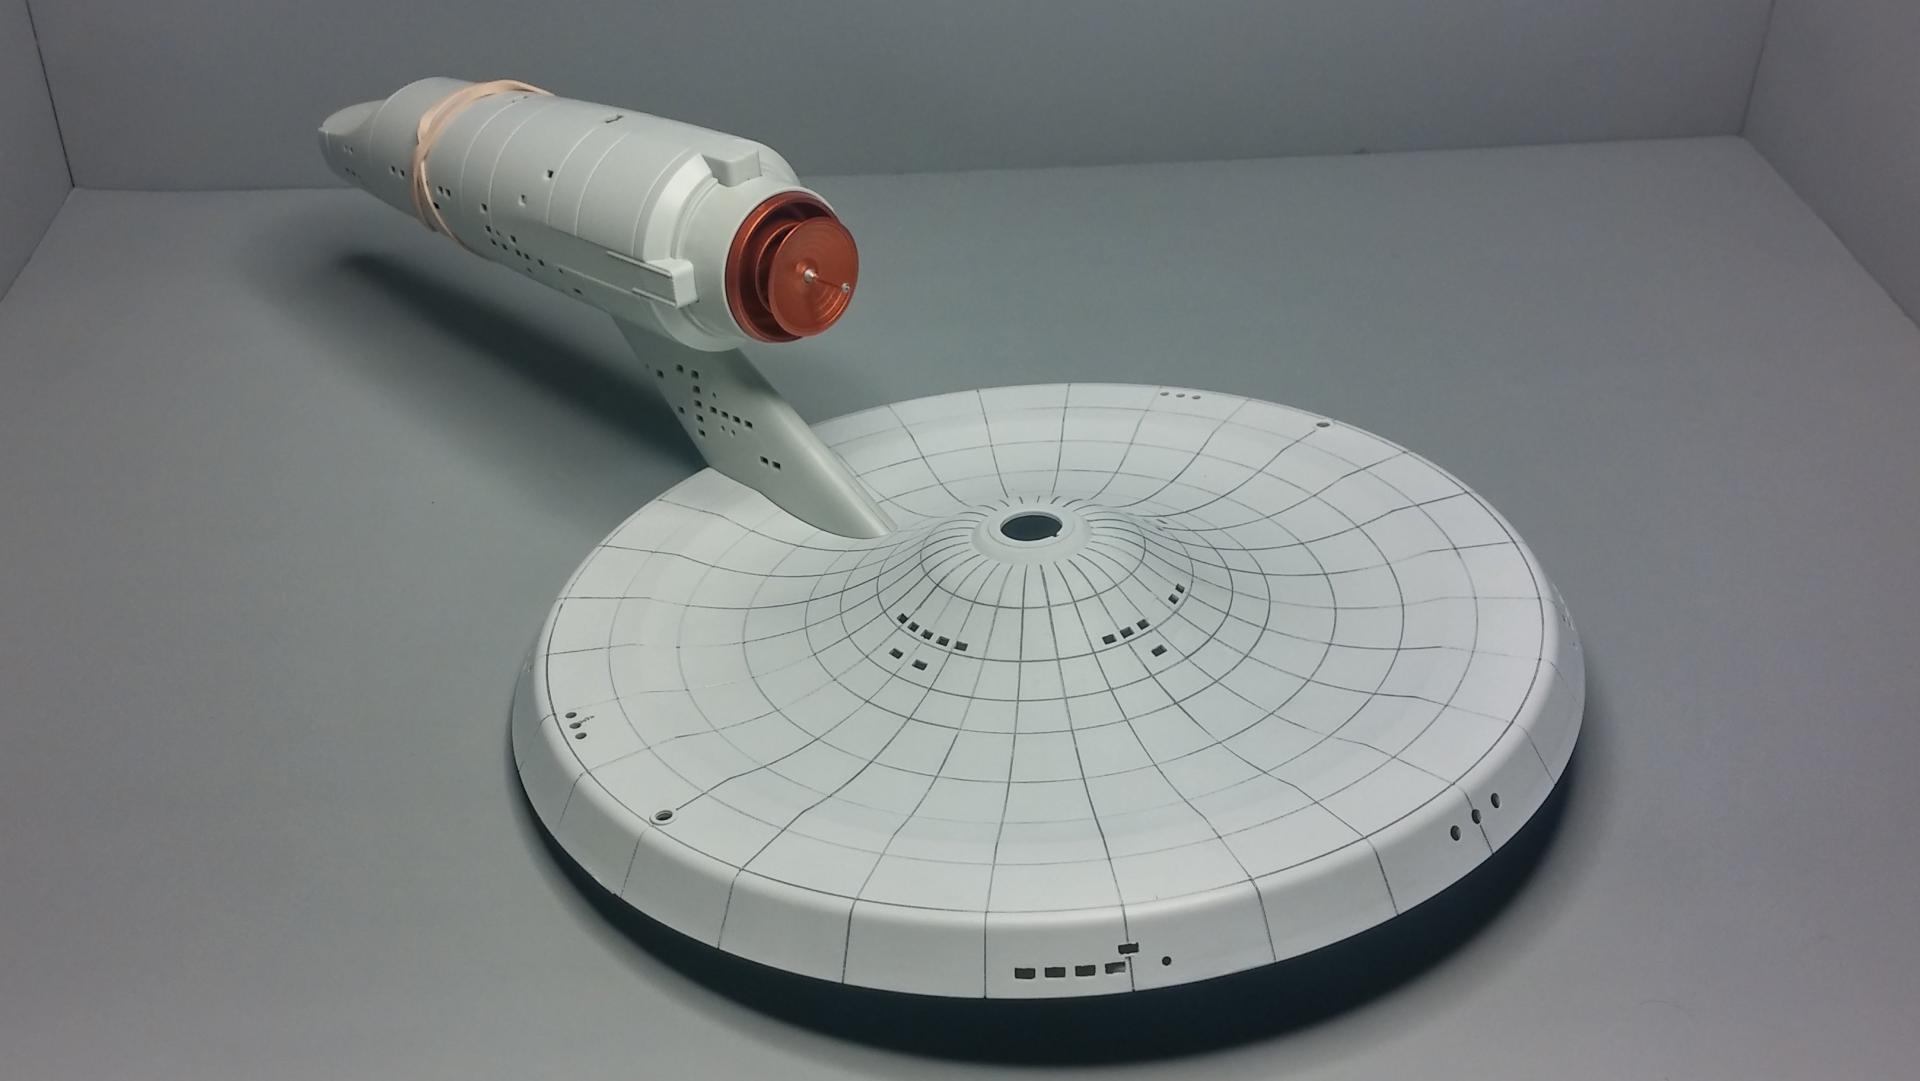 Starship_12.thumb.jpg.49ffb1368a21b6e6e8f05cf95a8c986c.jpg